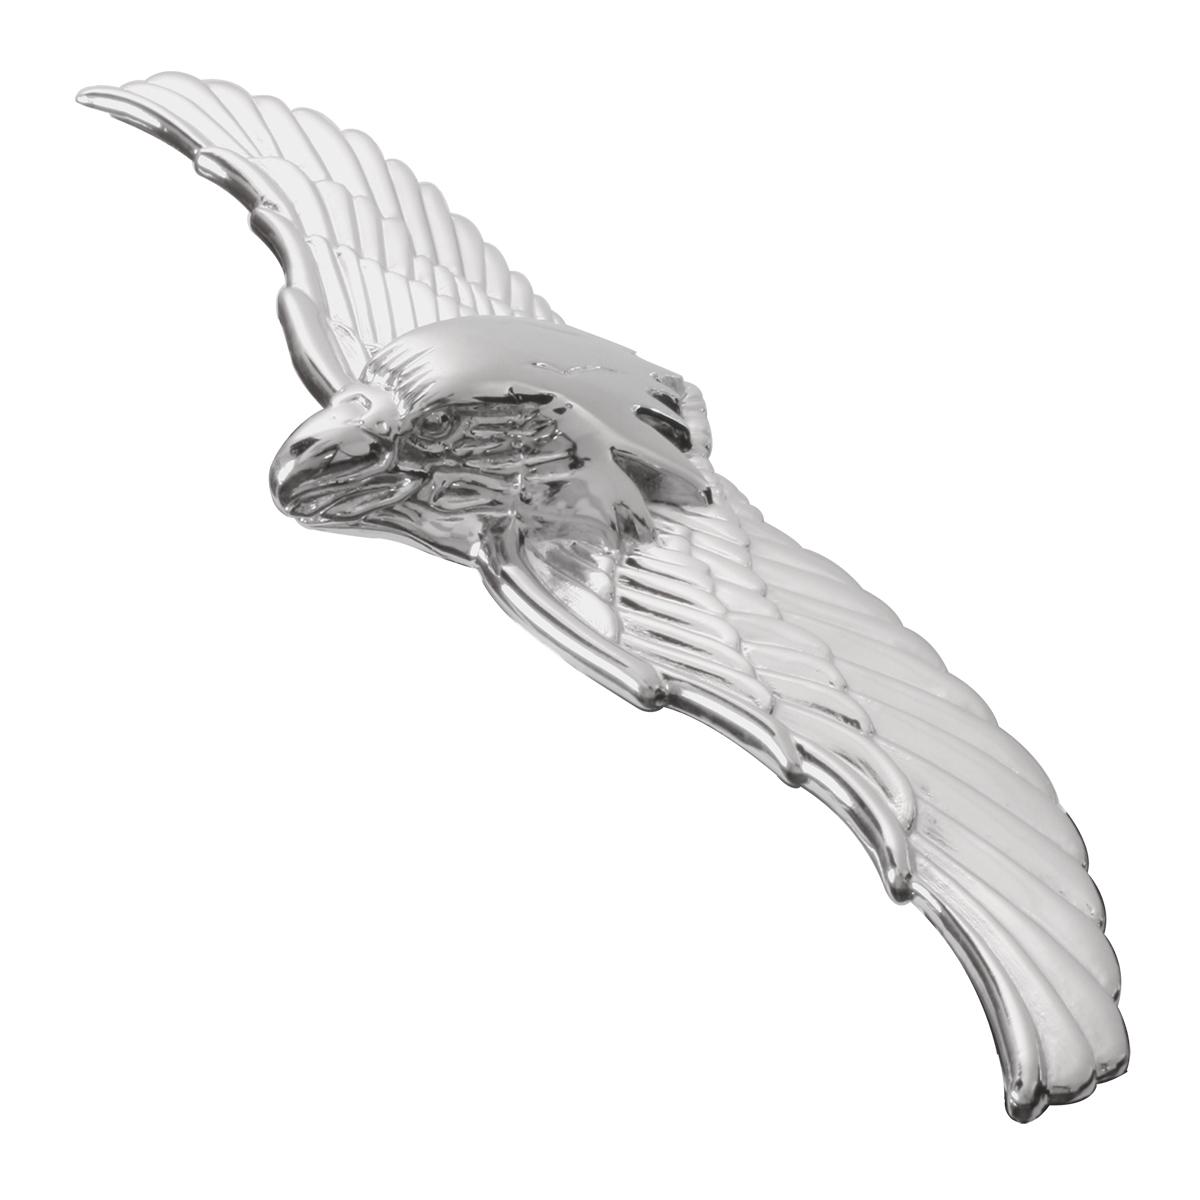 "#94052 Large 7 ½"" (L) x 2"" (W) x ¾"" (H) War Eagle Emblem Headlight Cover"